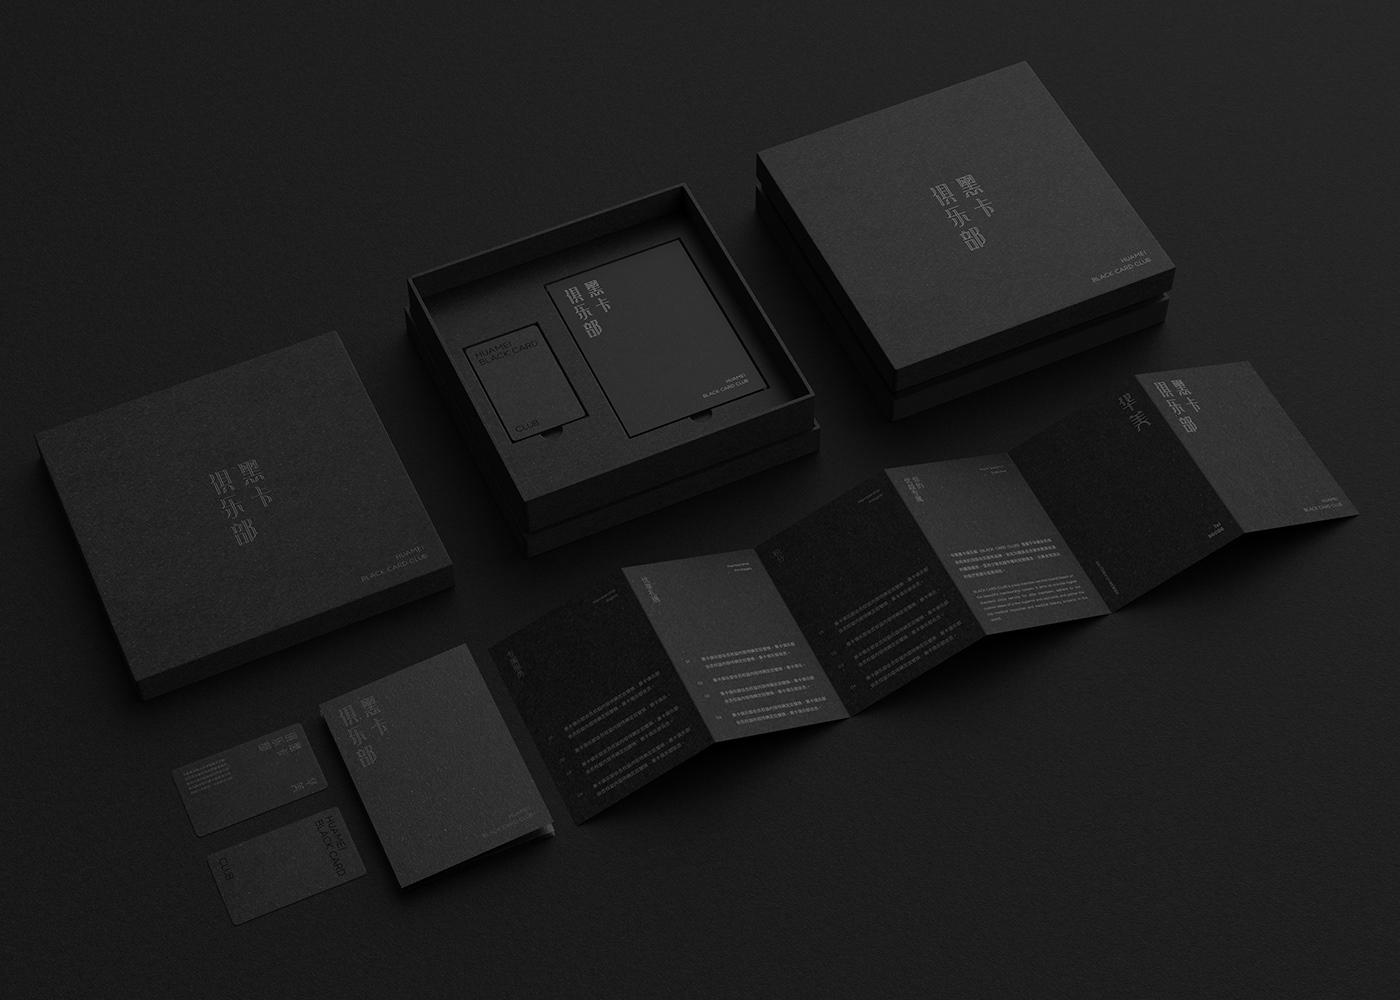 black box card china club doctors gift hospital medical package